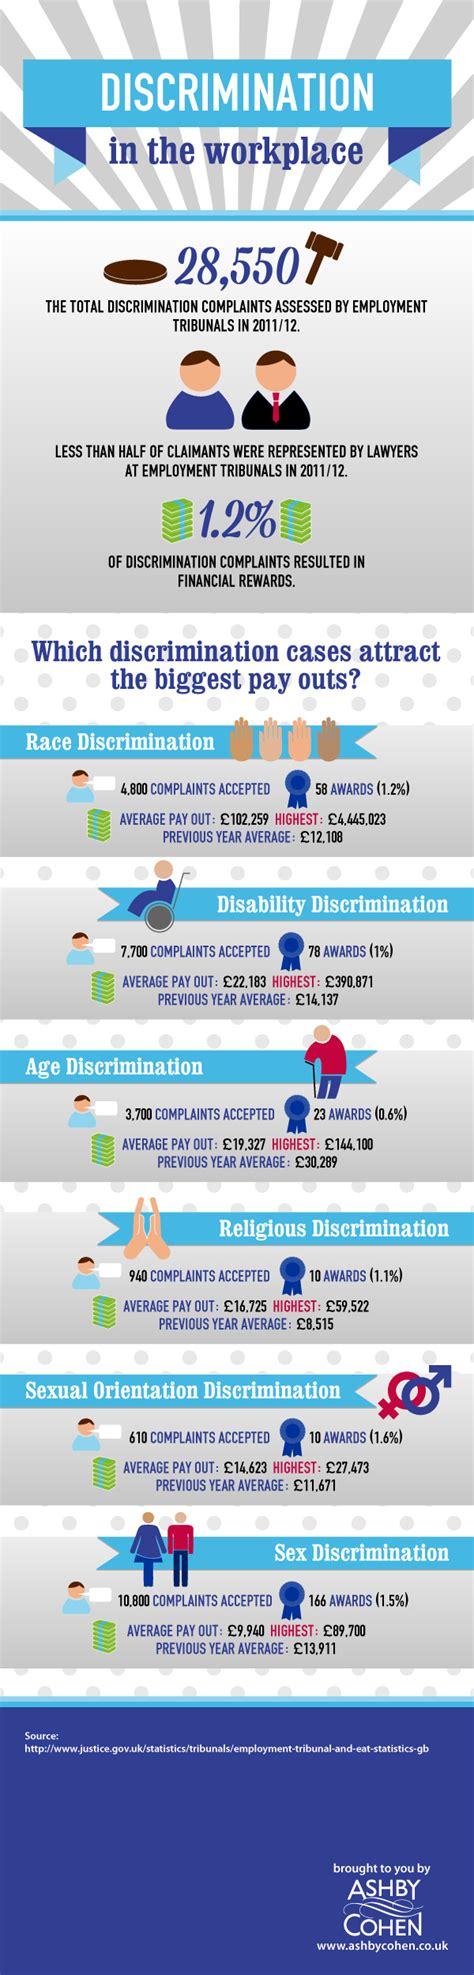 41 affirmative discrimination statistics brandongaille